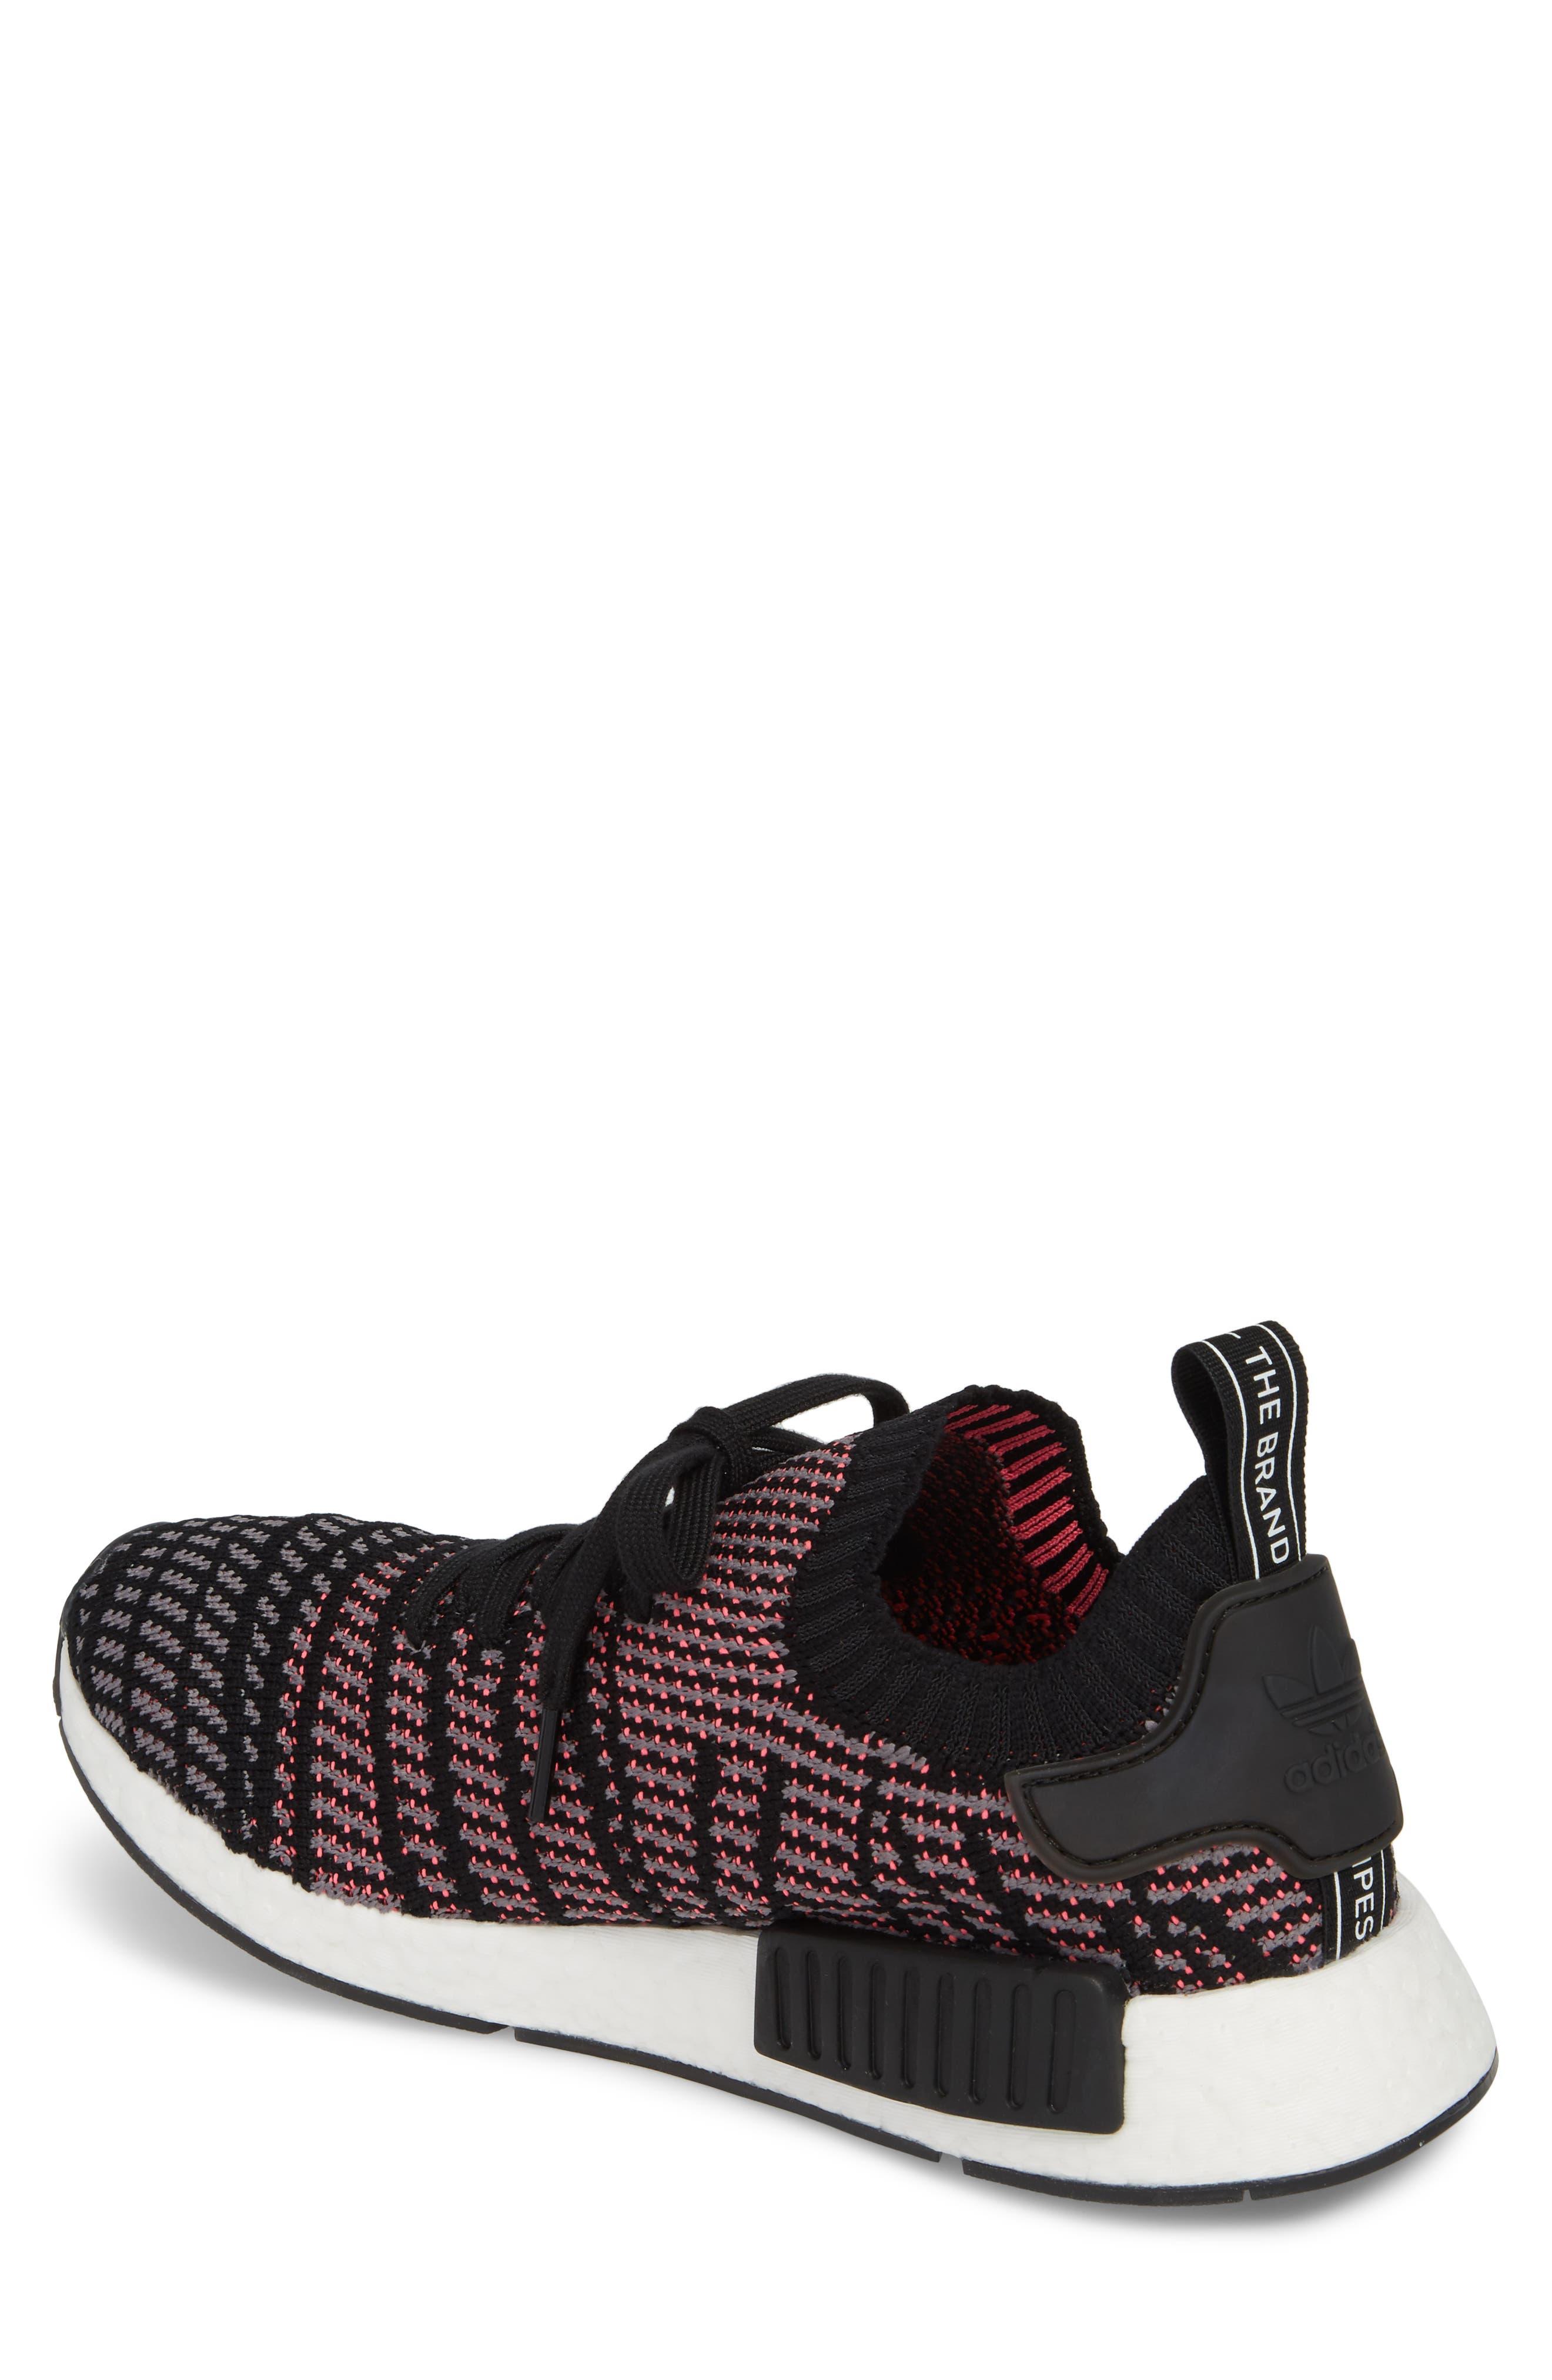 NMD R1 STLT Primeknit Sneaker,                             Alternate thumbnail 4, color,